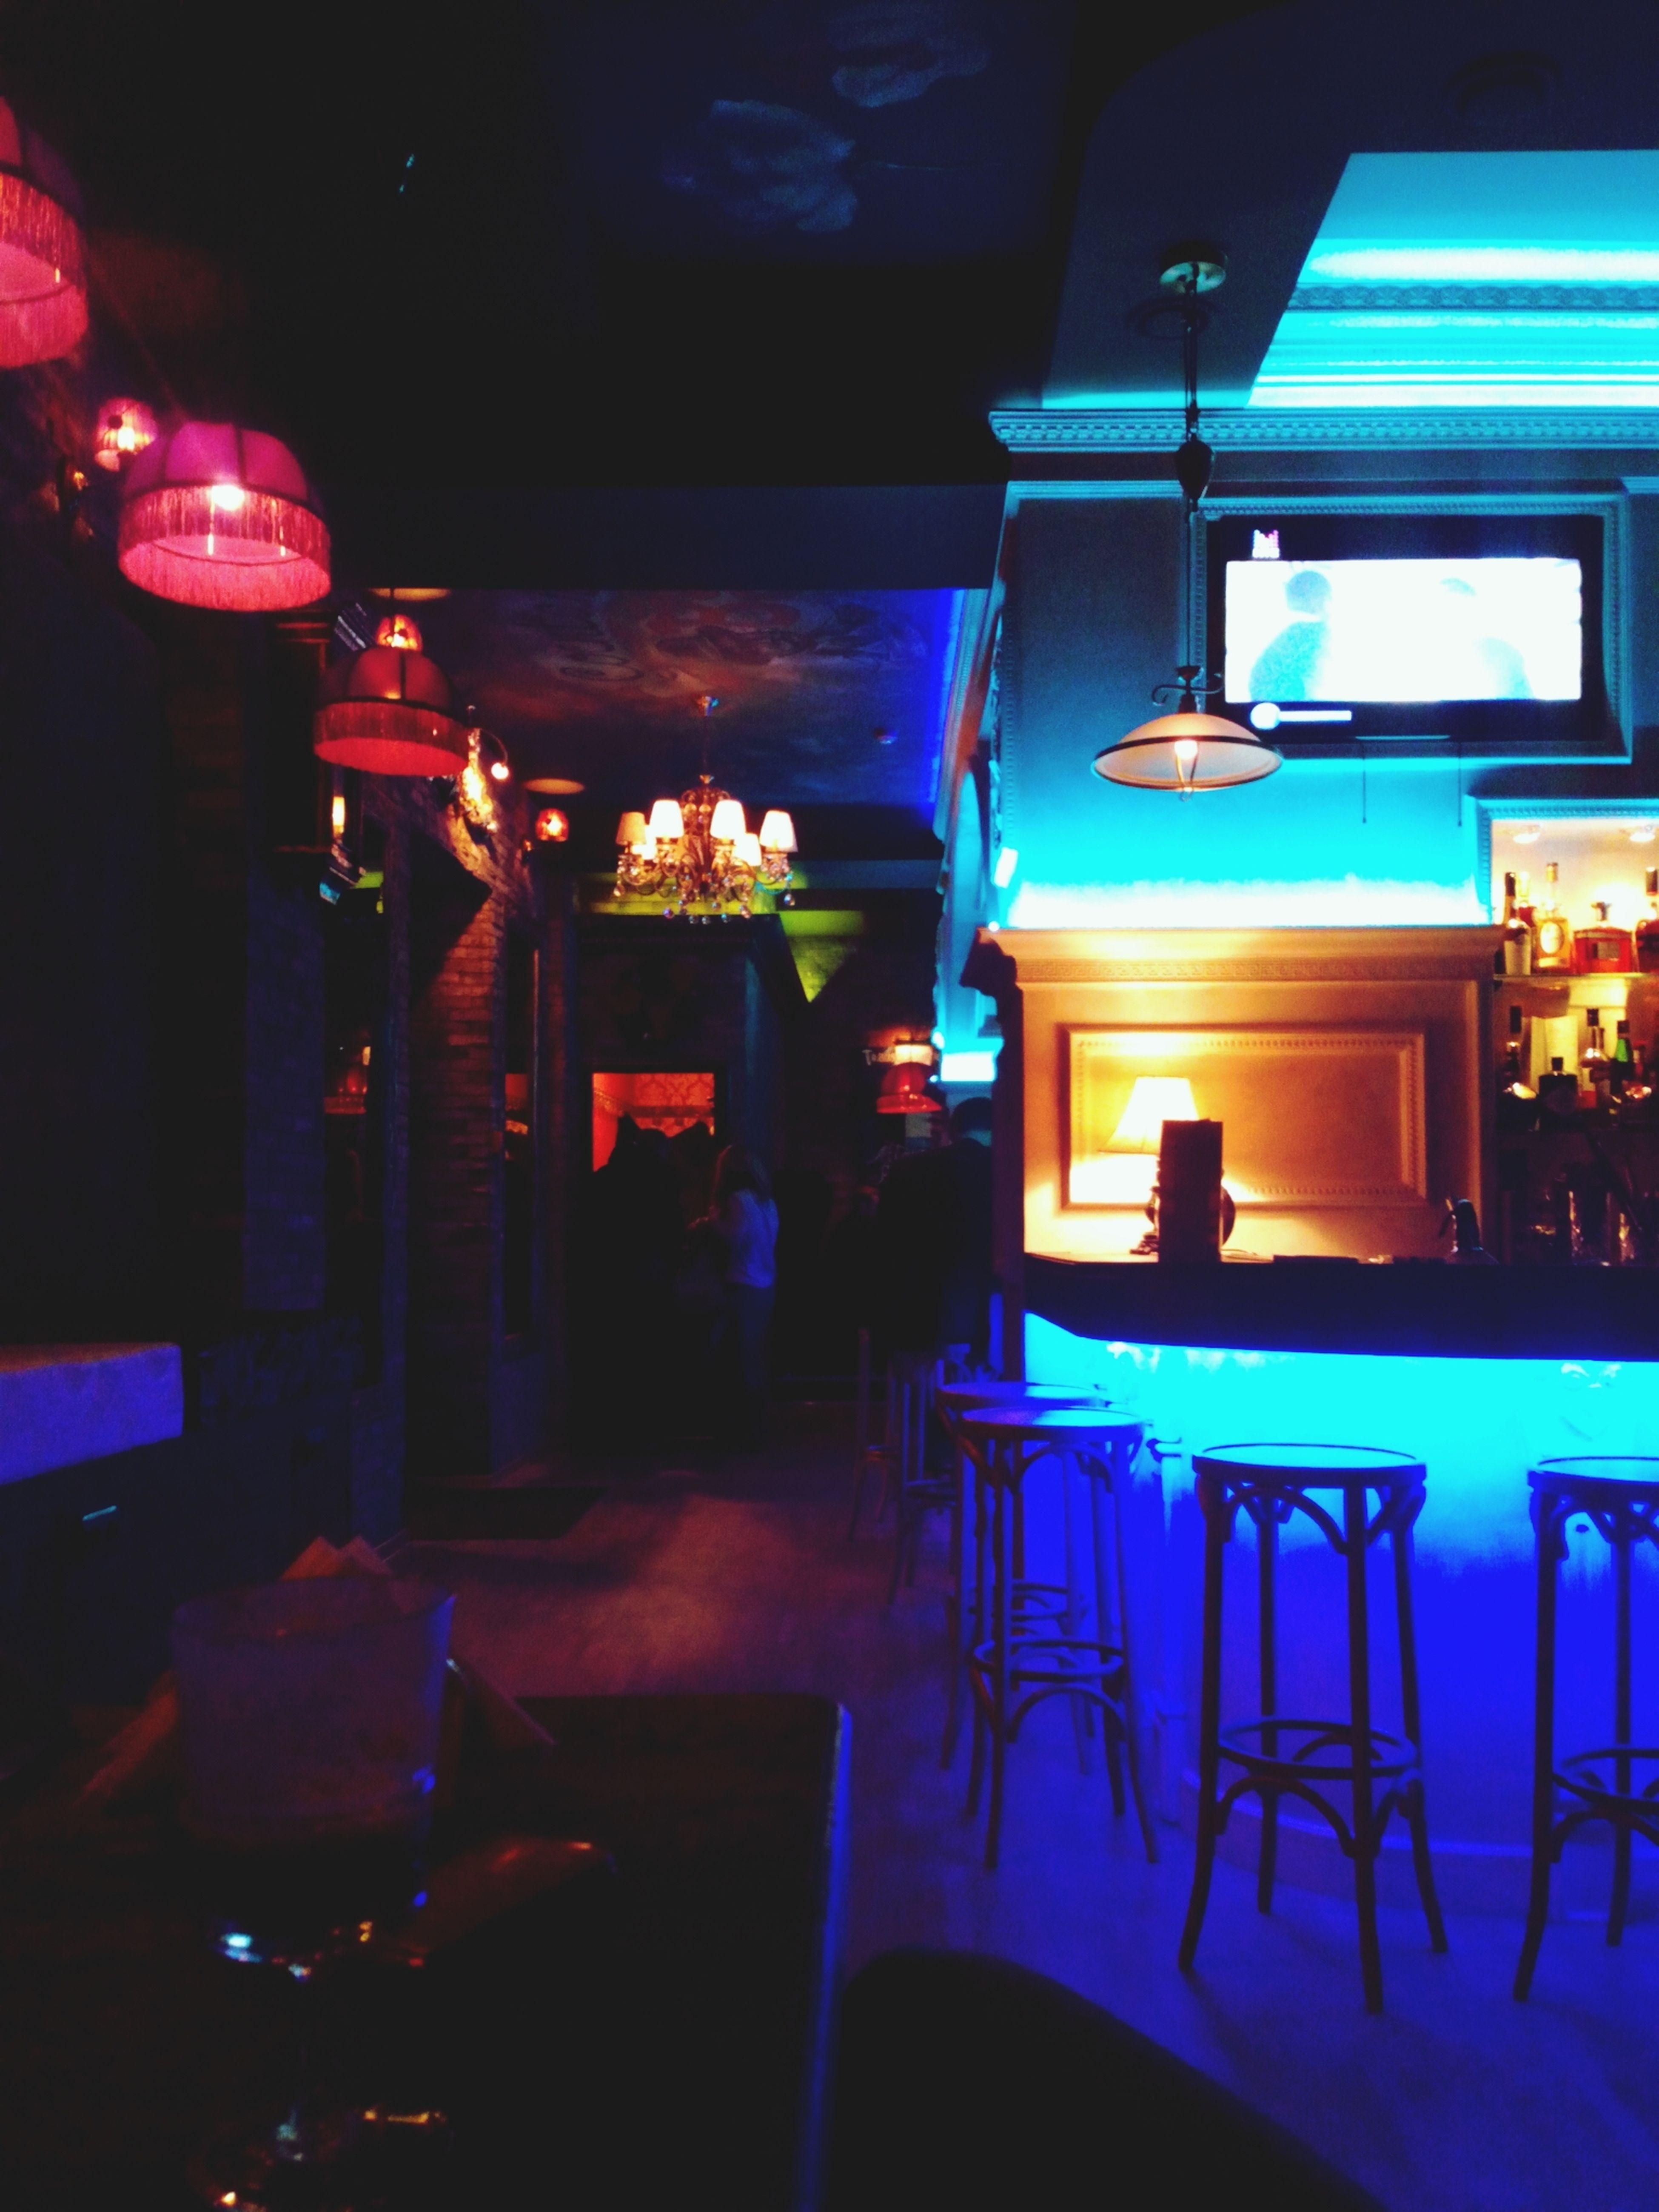 Bar Nightlife Interior Design Interior